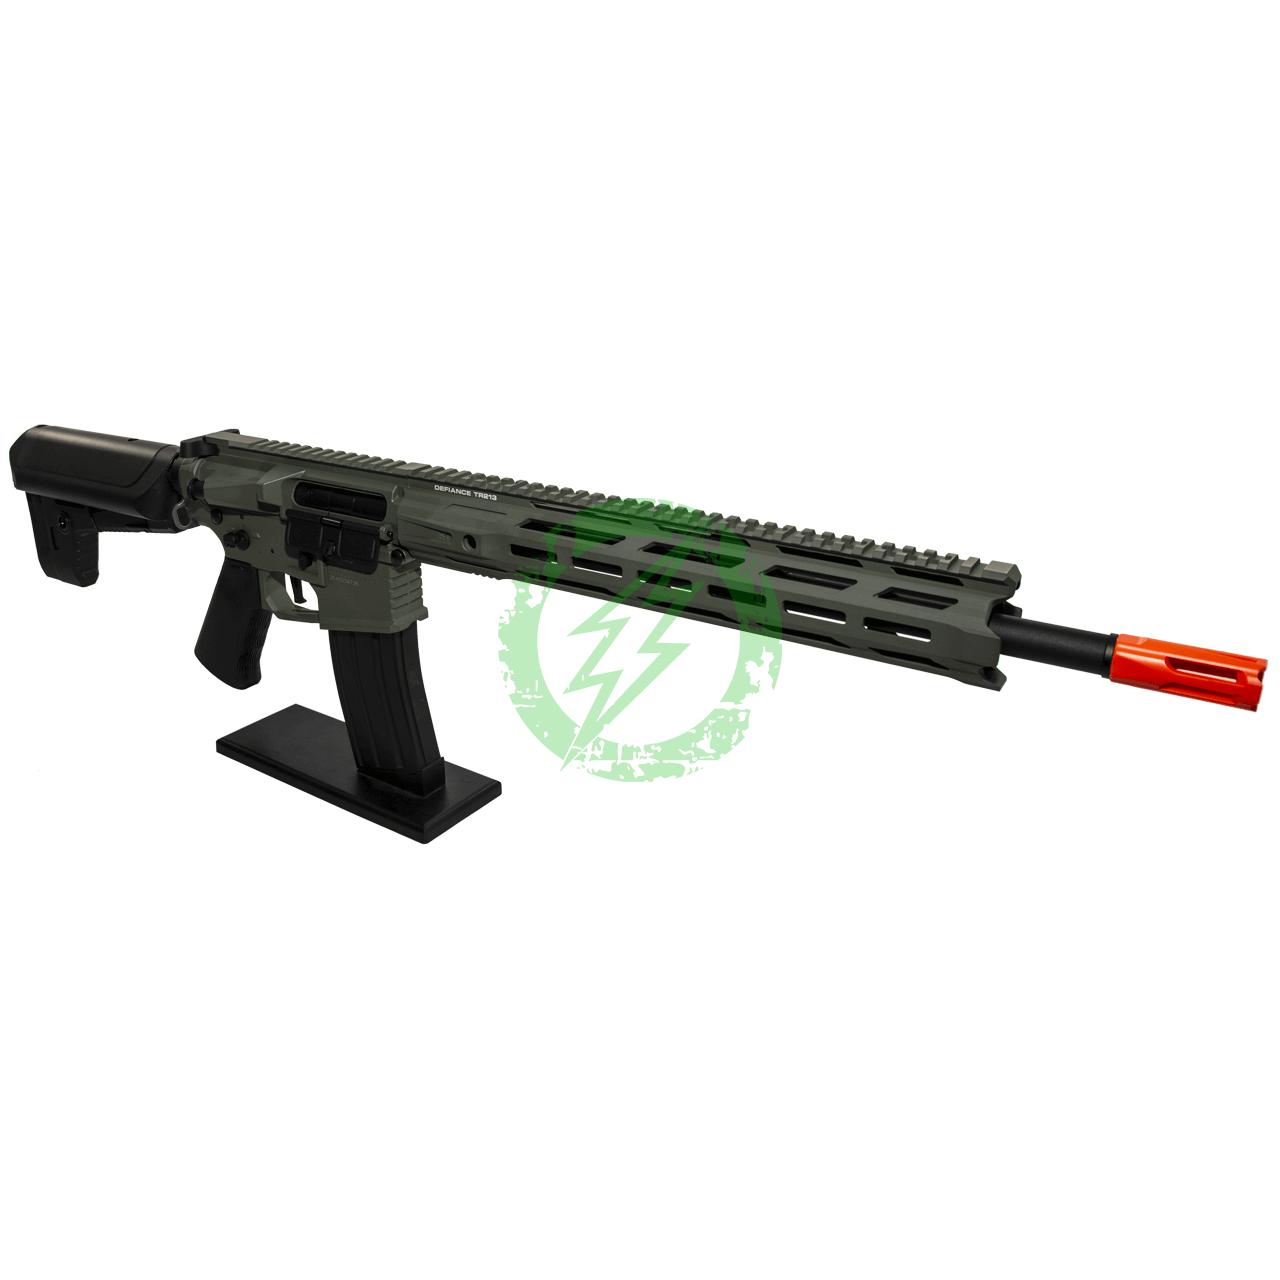 Krytac Full Metal Trident MKII-M SPR Rifle   Foliage Green   MLOK